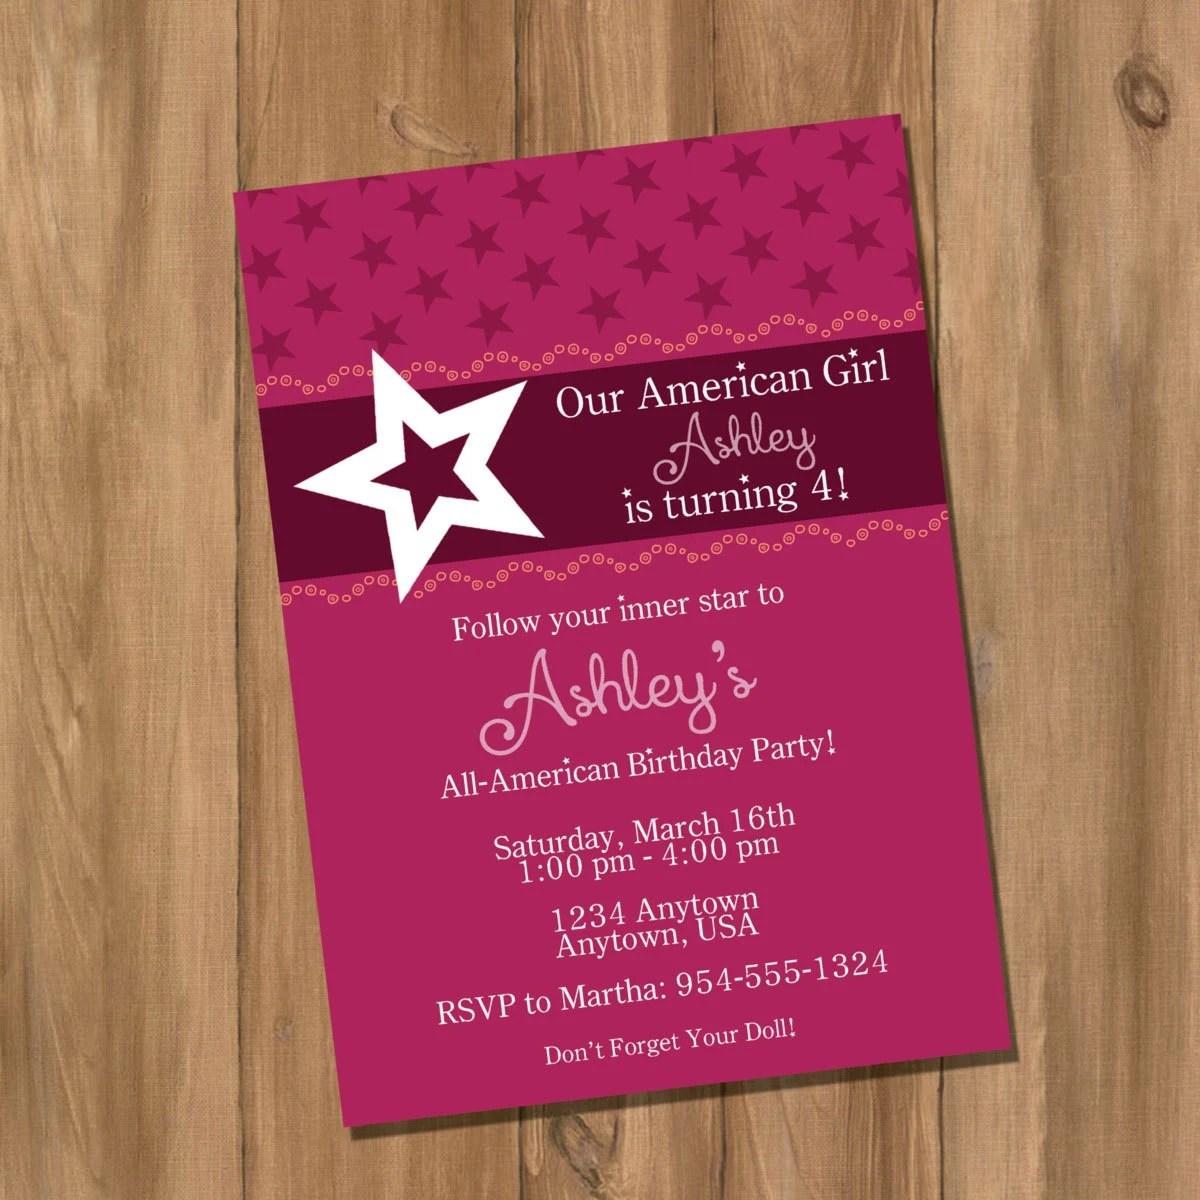 American Doll Girl Birthday Party Invitation Digital Diy